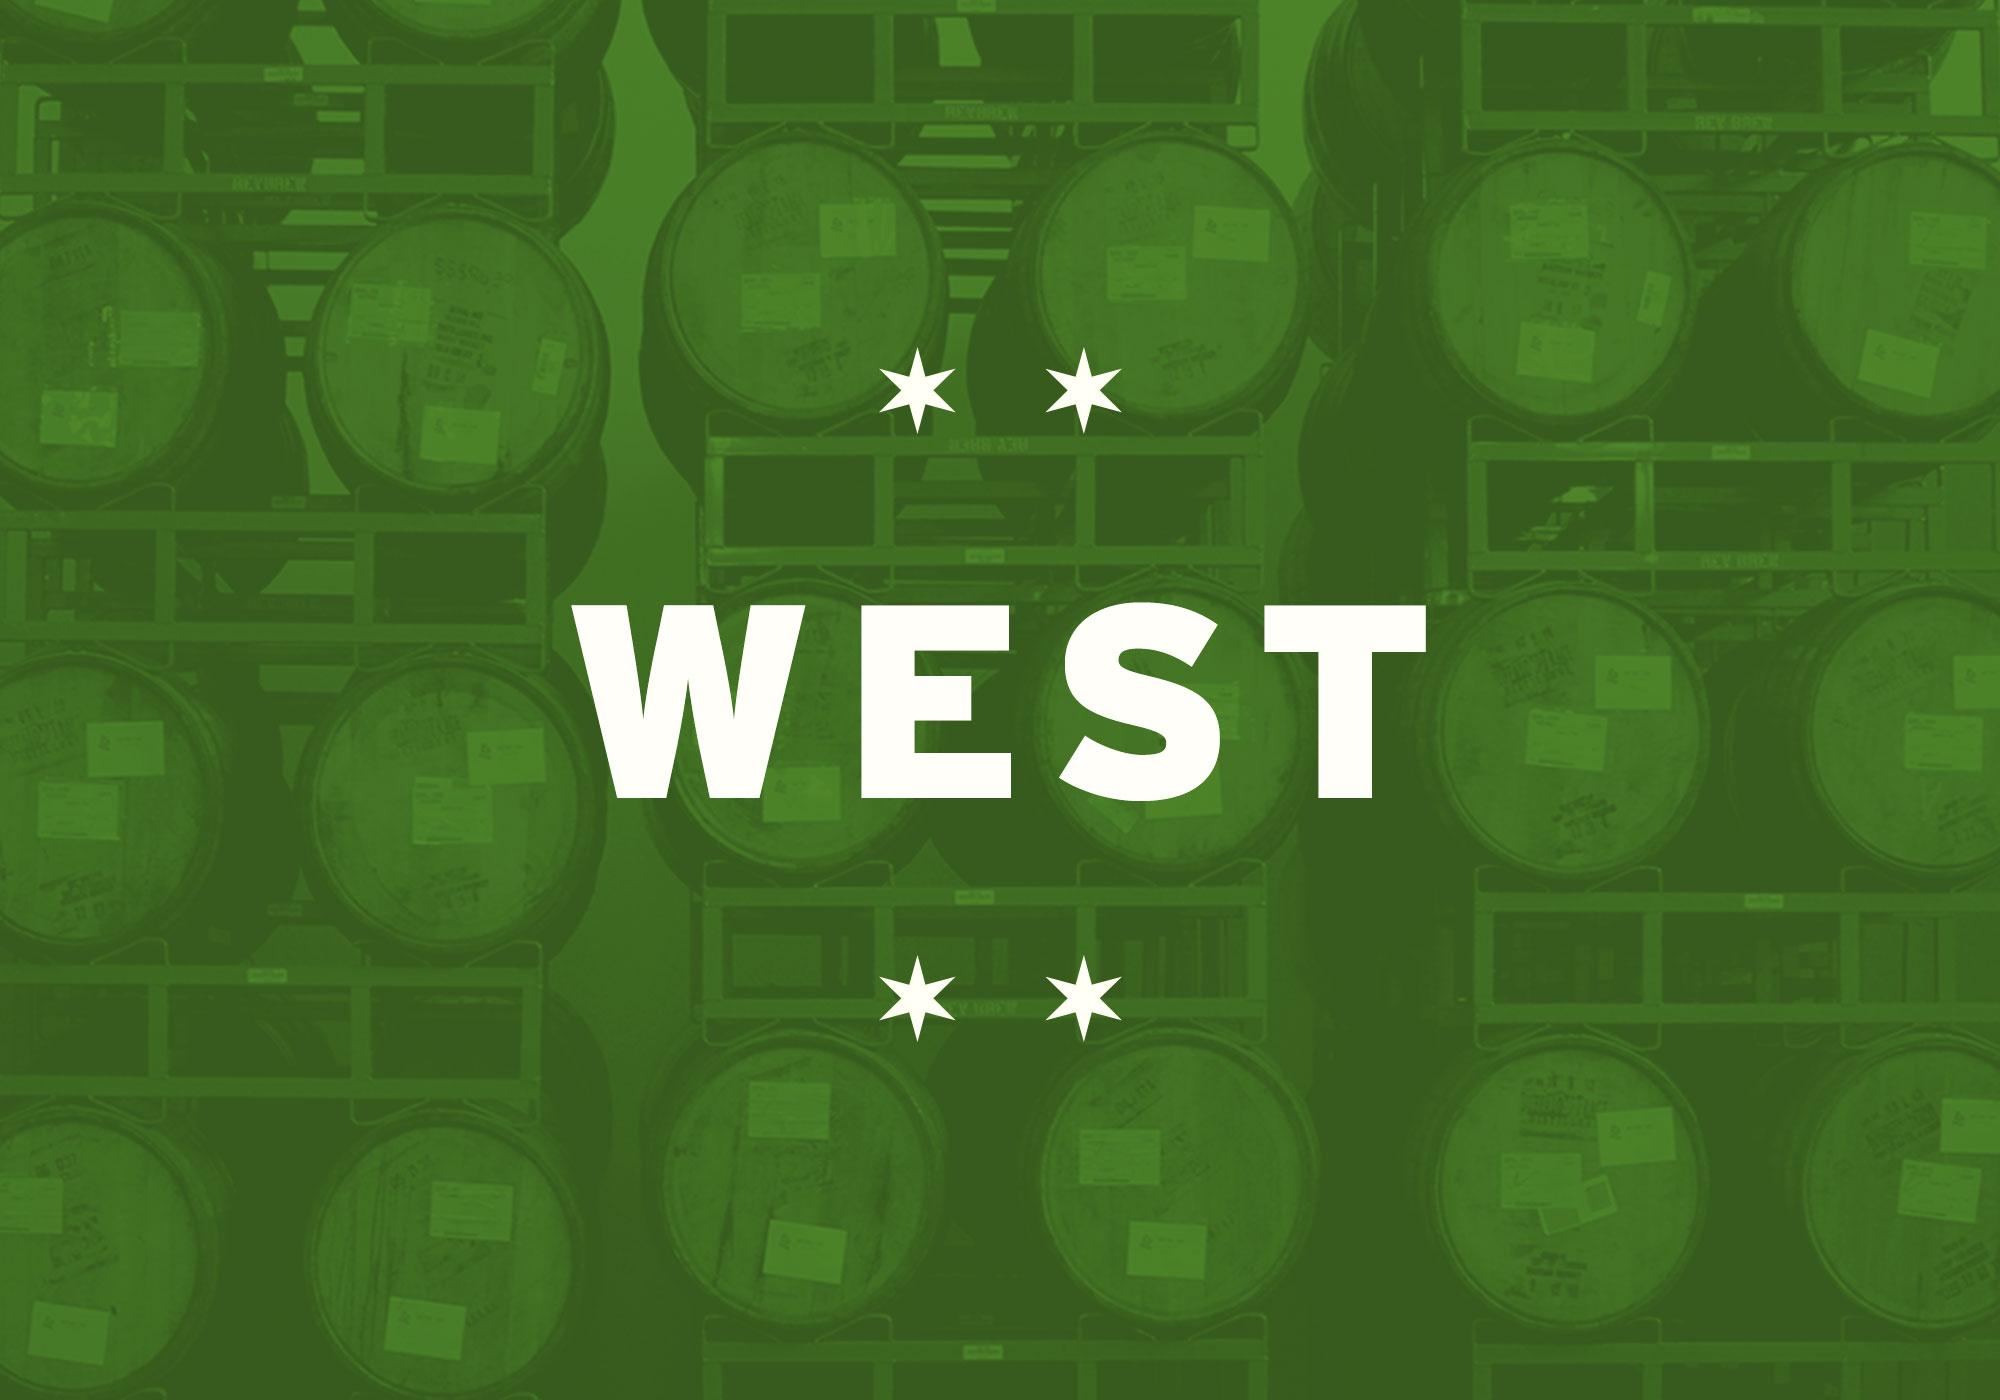 ChicagoBreweryBracket_2019-West.jpg